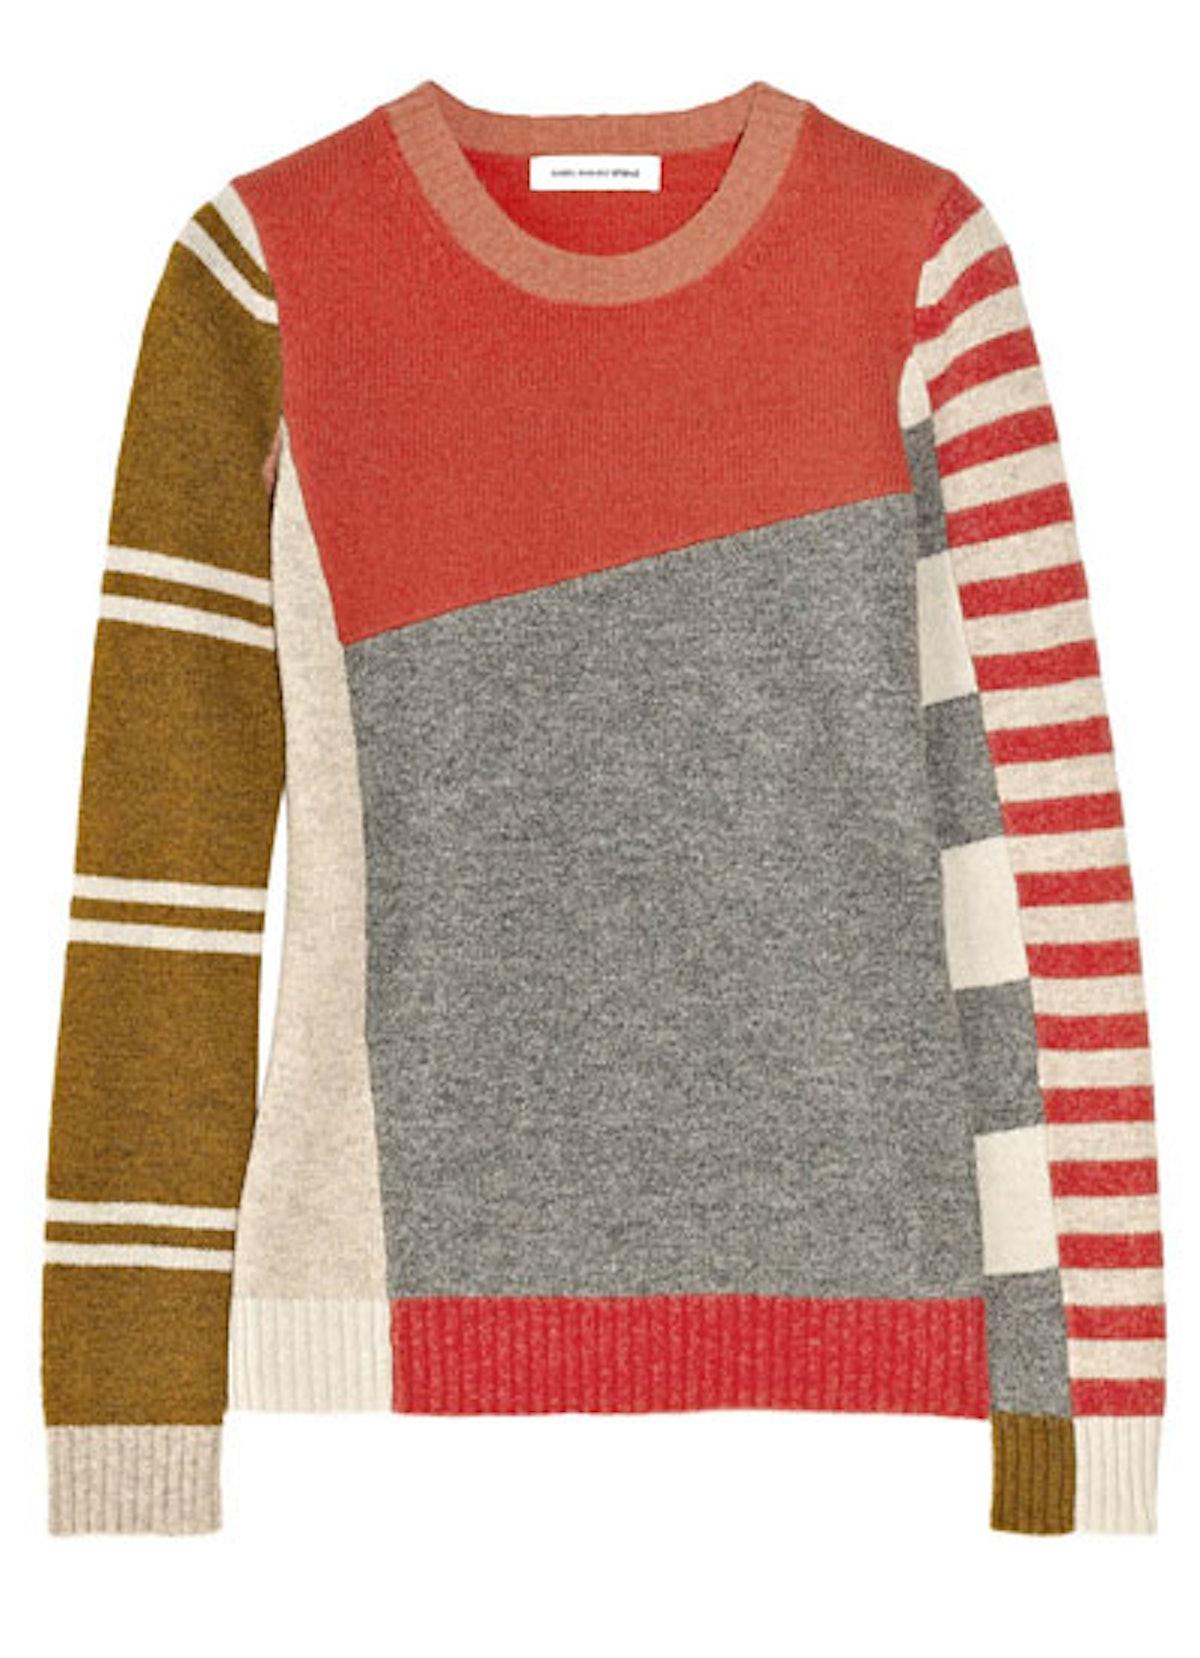 fass-graphic-knits-05-v.jpg